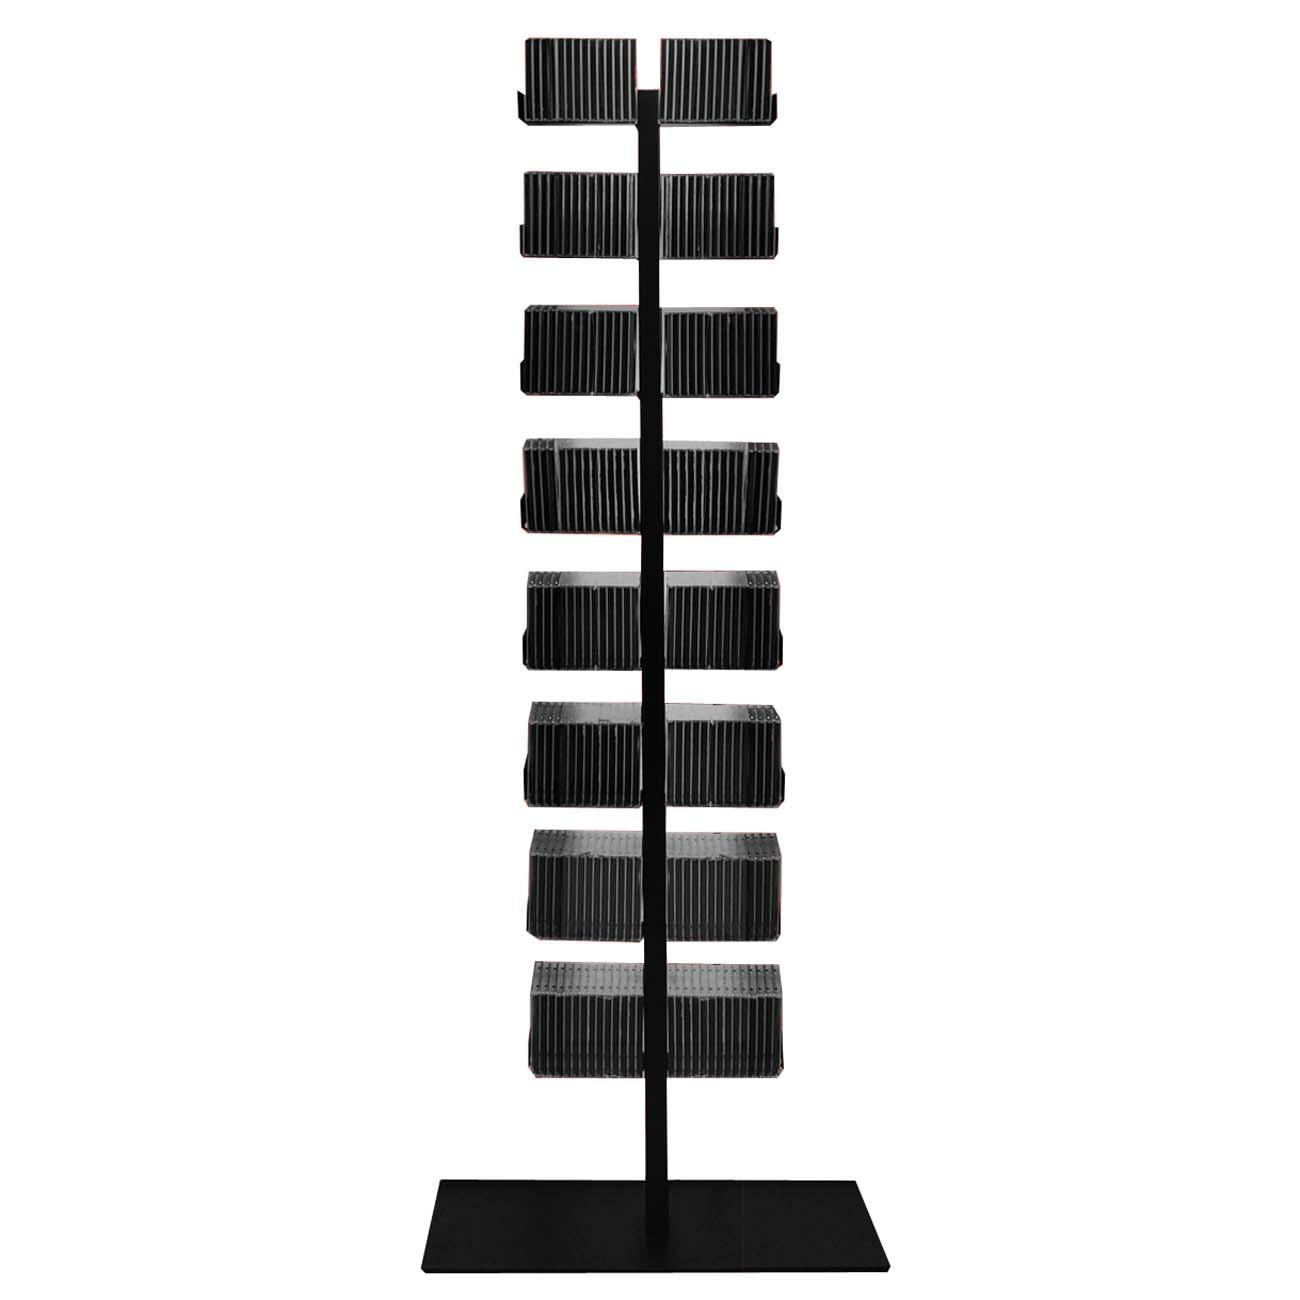 radius cd baum regal schwarz stand 1 gro 719 a m bel regale standregale. Black Bedroom Furniture Sets. Home Design Ideas